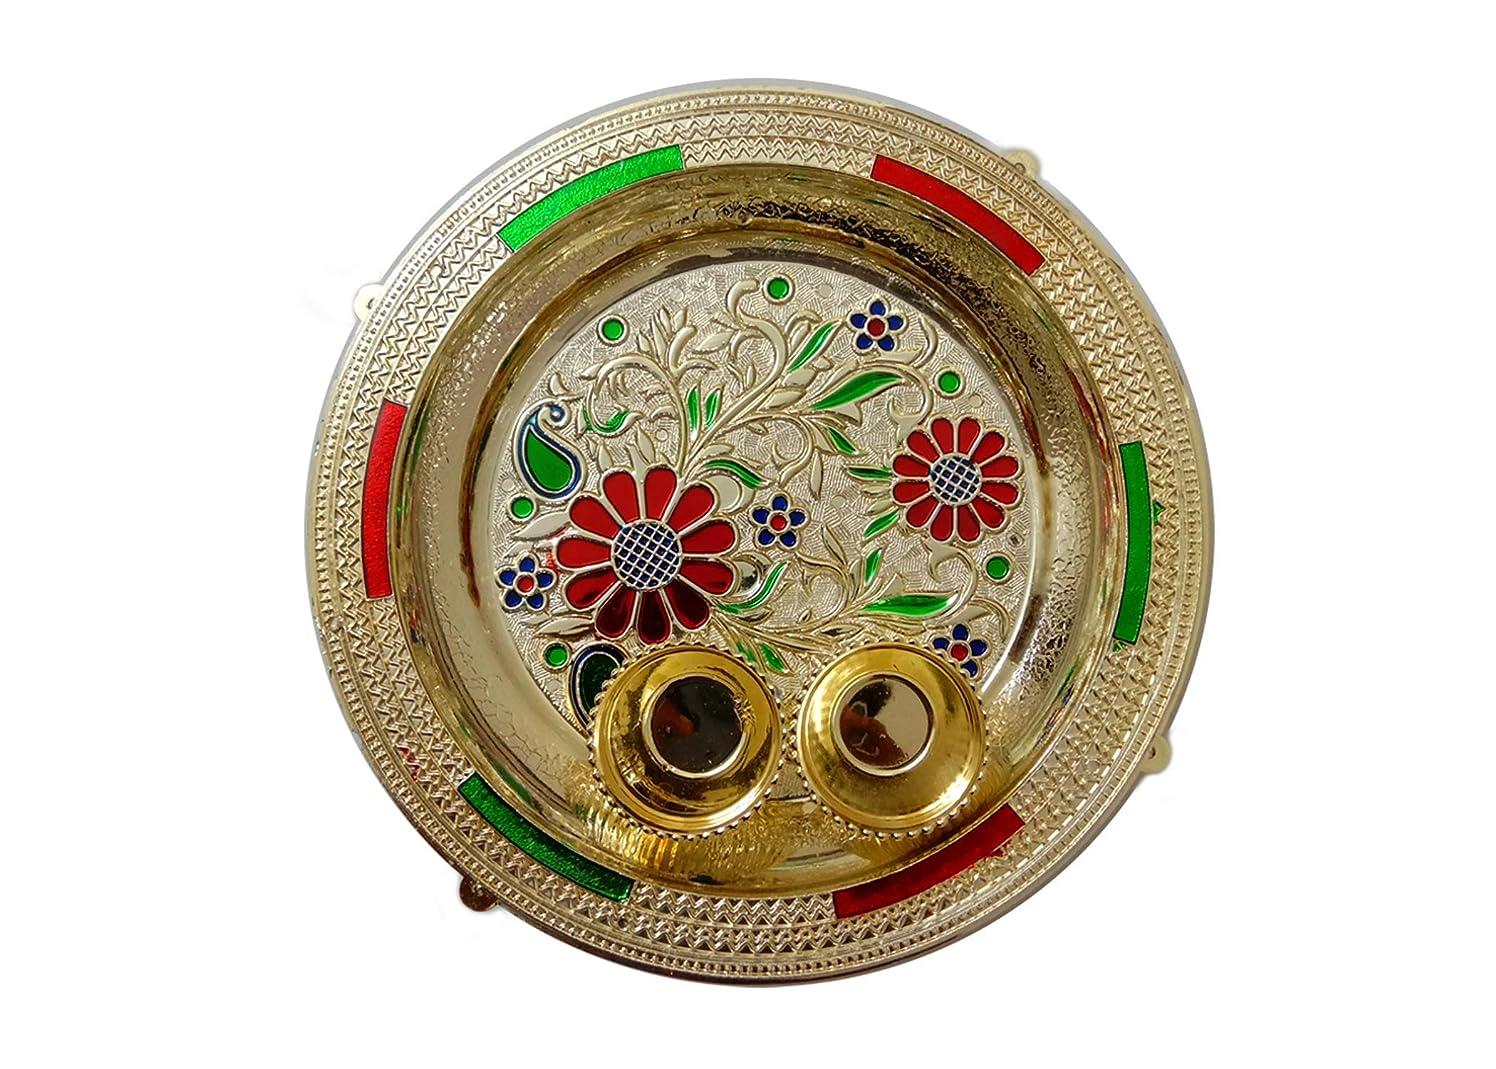 Designer Art Pooja Thali/Puja Thali, Pooja Thali Decorative Platter Set for Karwachauth Puja/Pooja Diwali/Deepawali Laxmi,Durga,Ganesh Pooja for Hindu Puja (Thali 9)